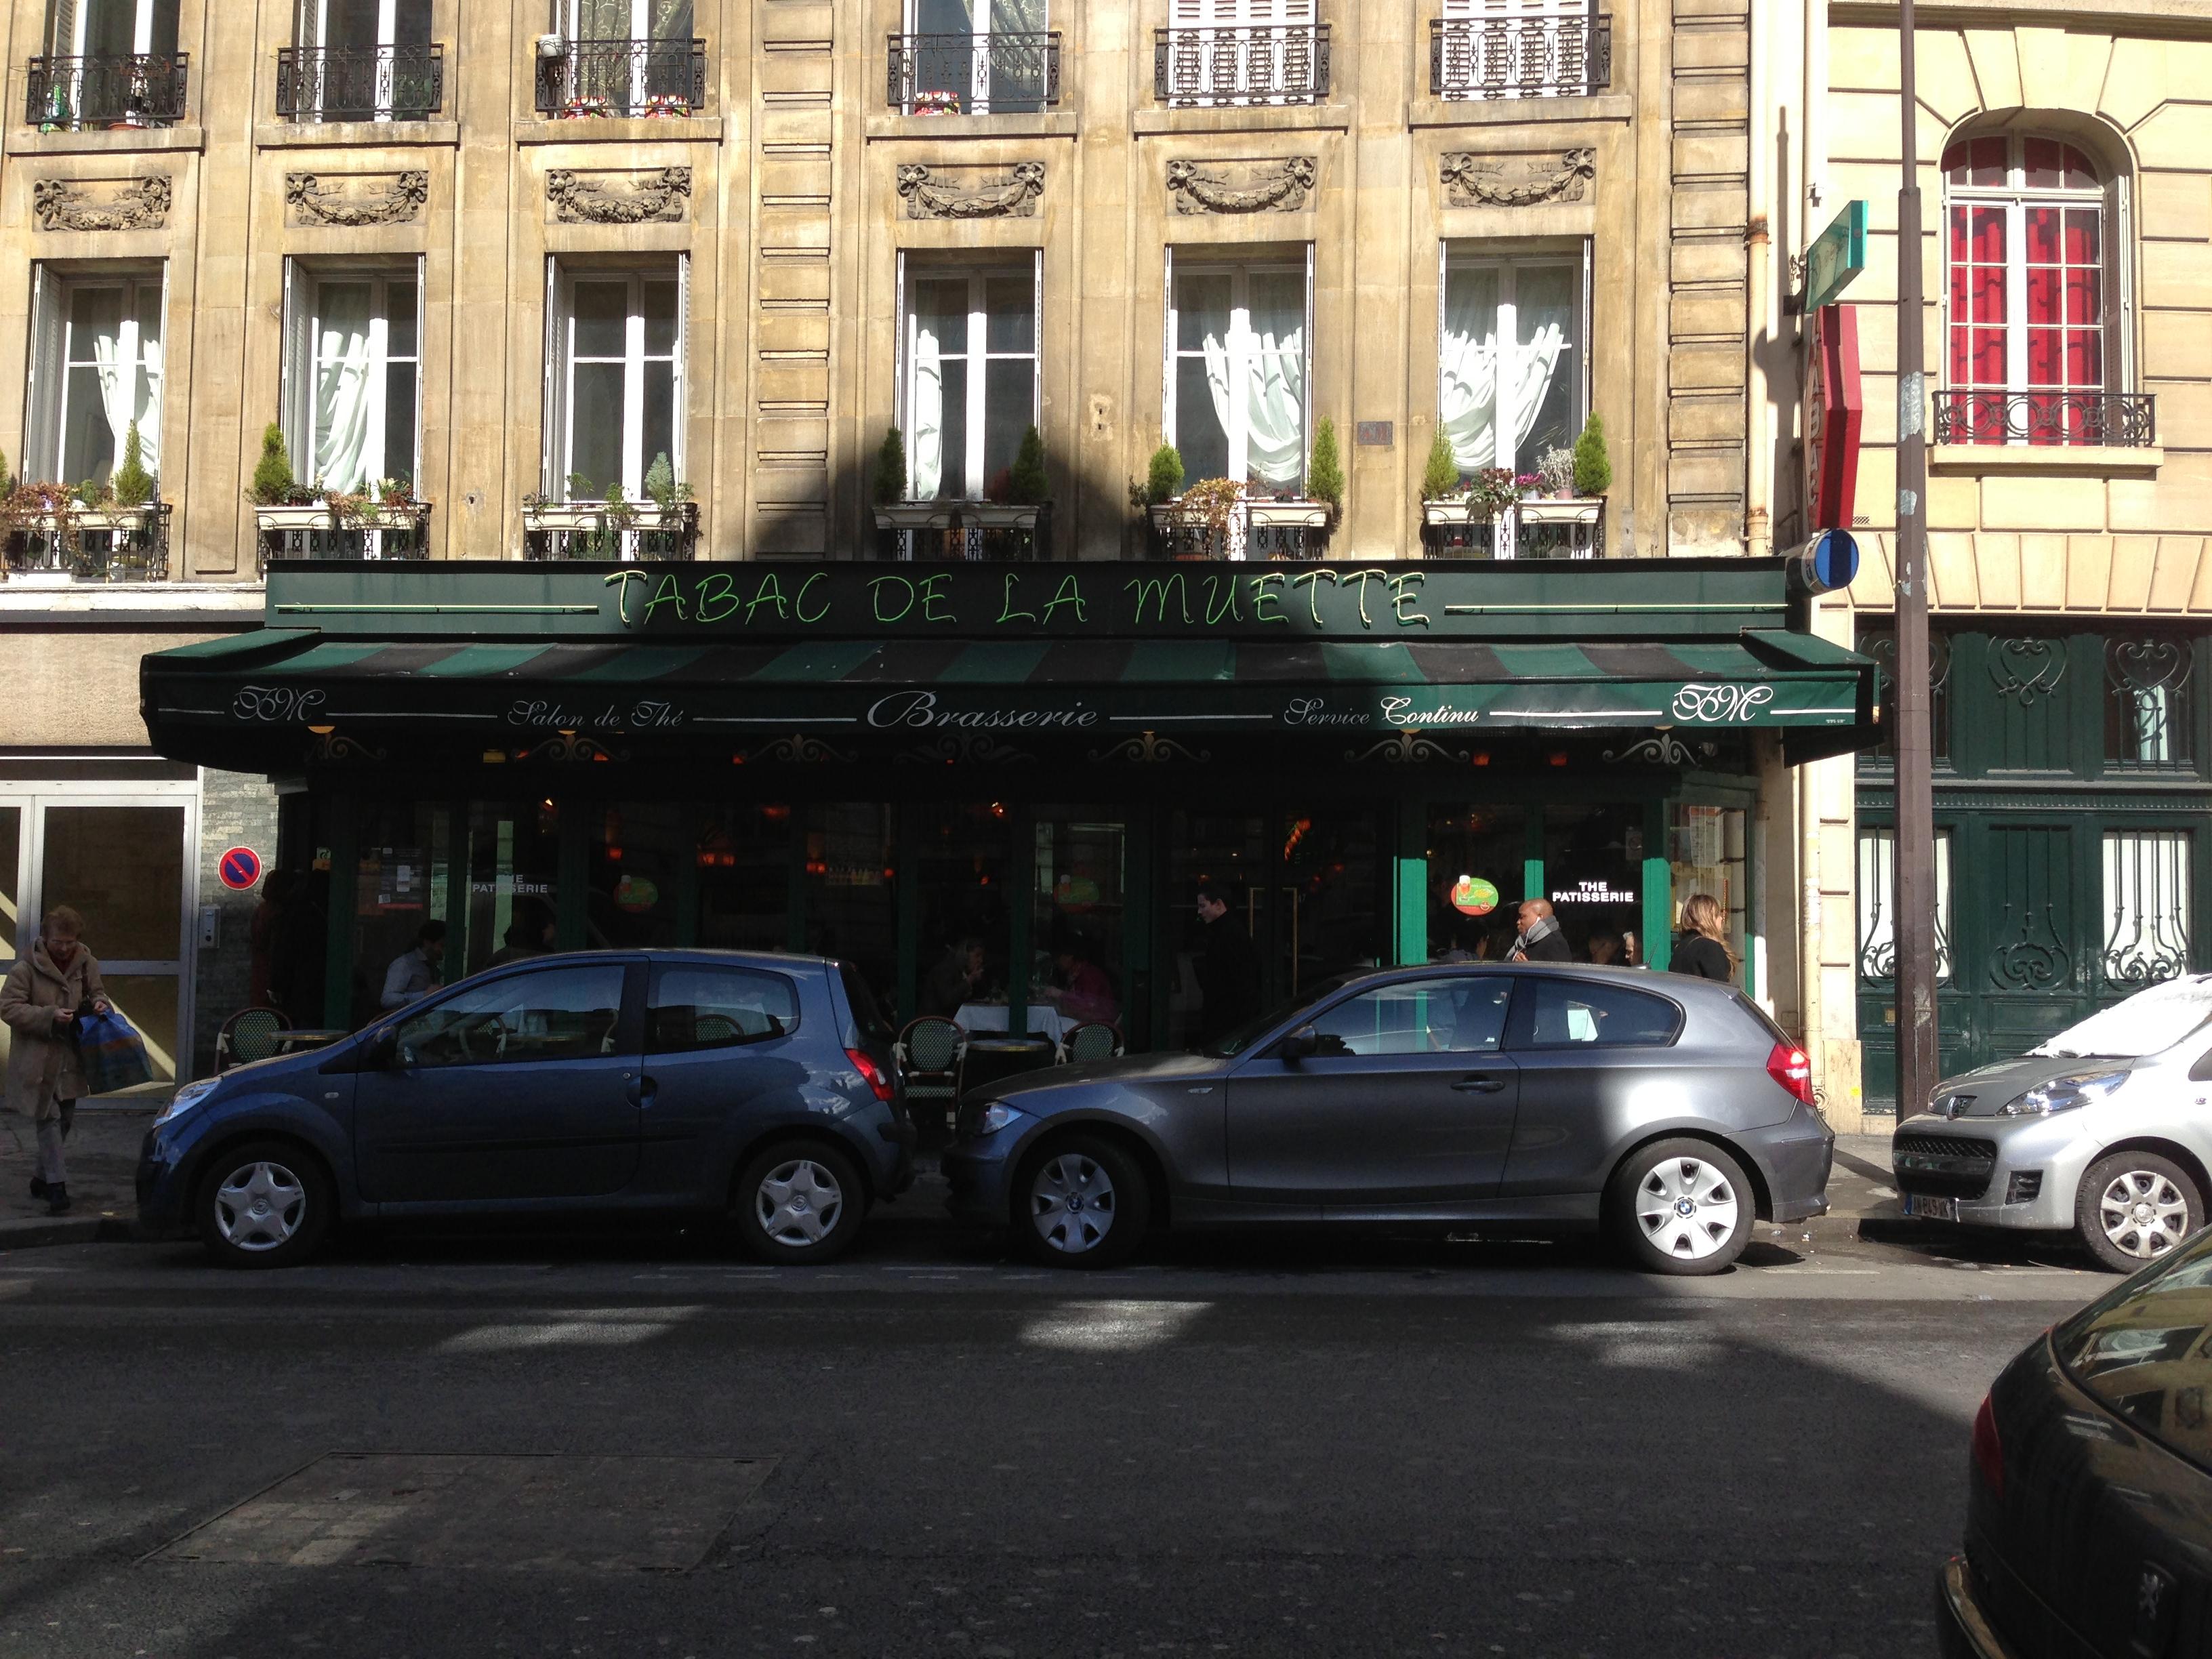 Le tabac de la muette in bistro veritas for Salon du tabac paris